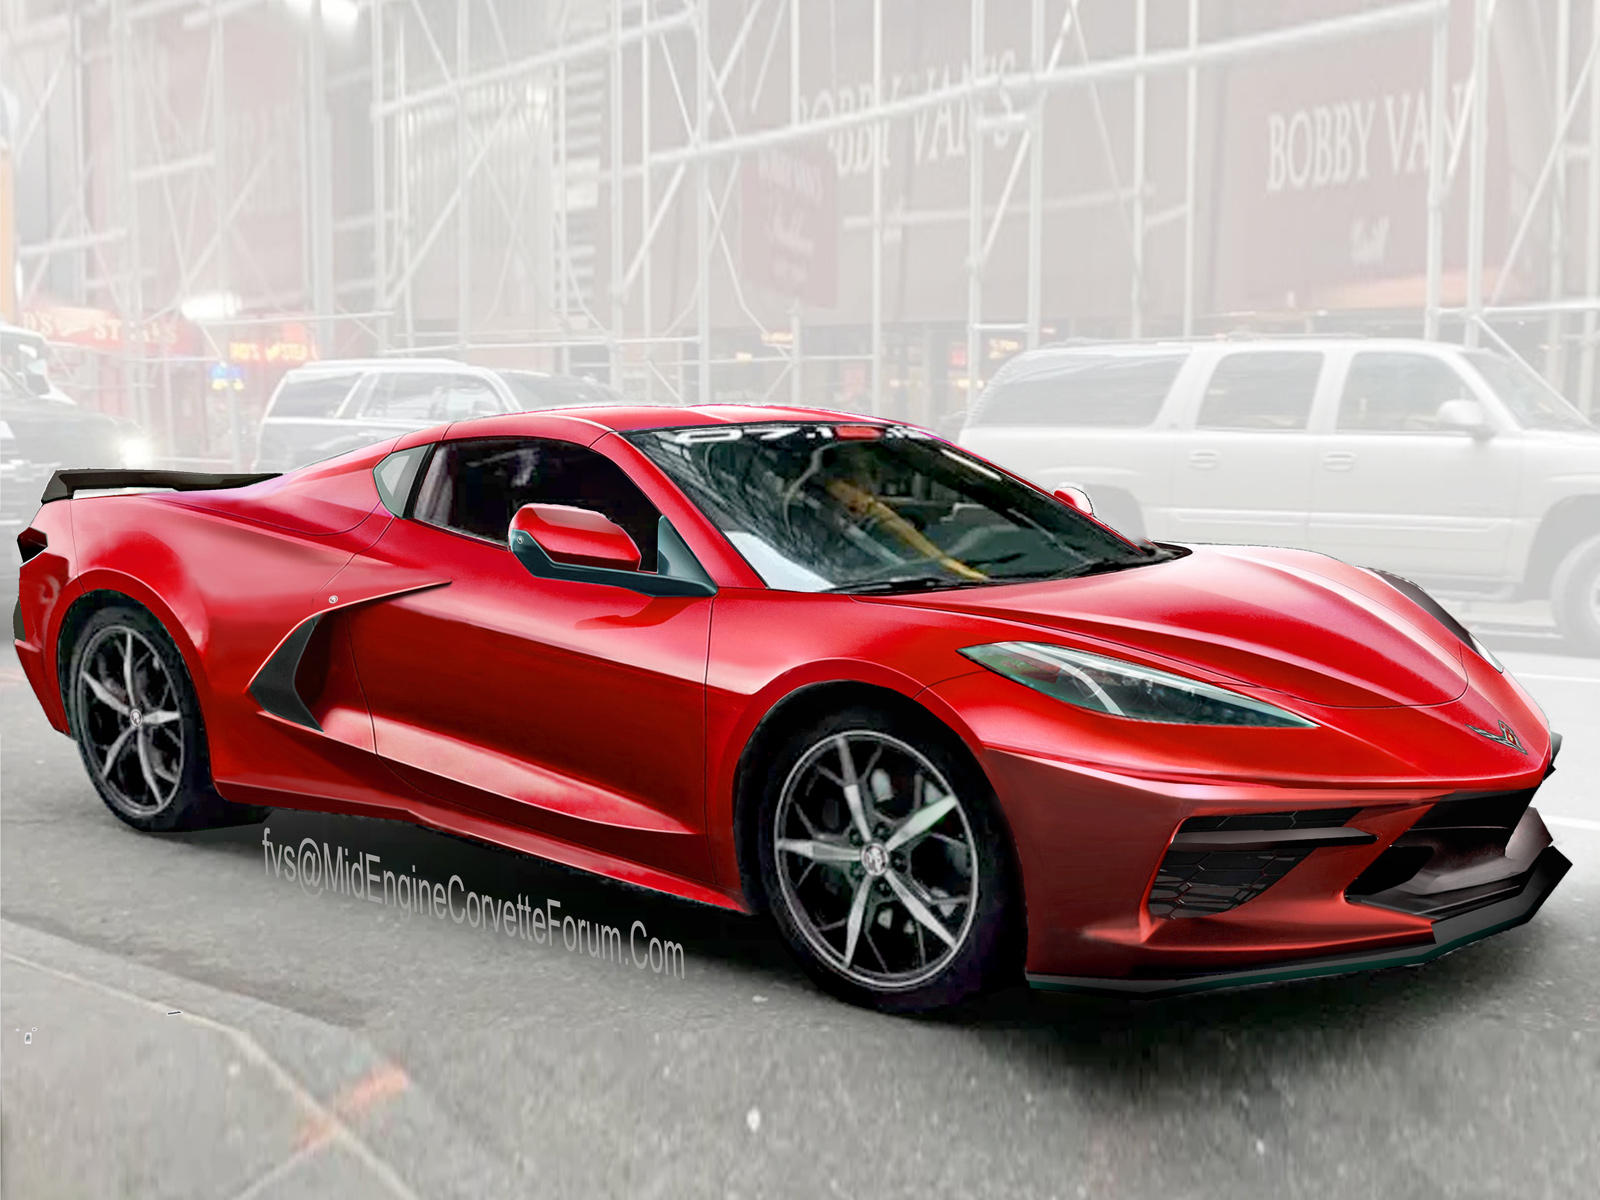 A Major Corvette C8 Announcement Is Happening Today